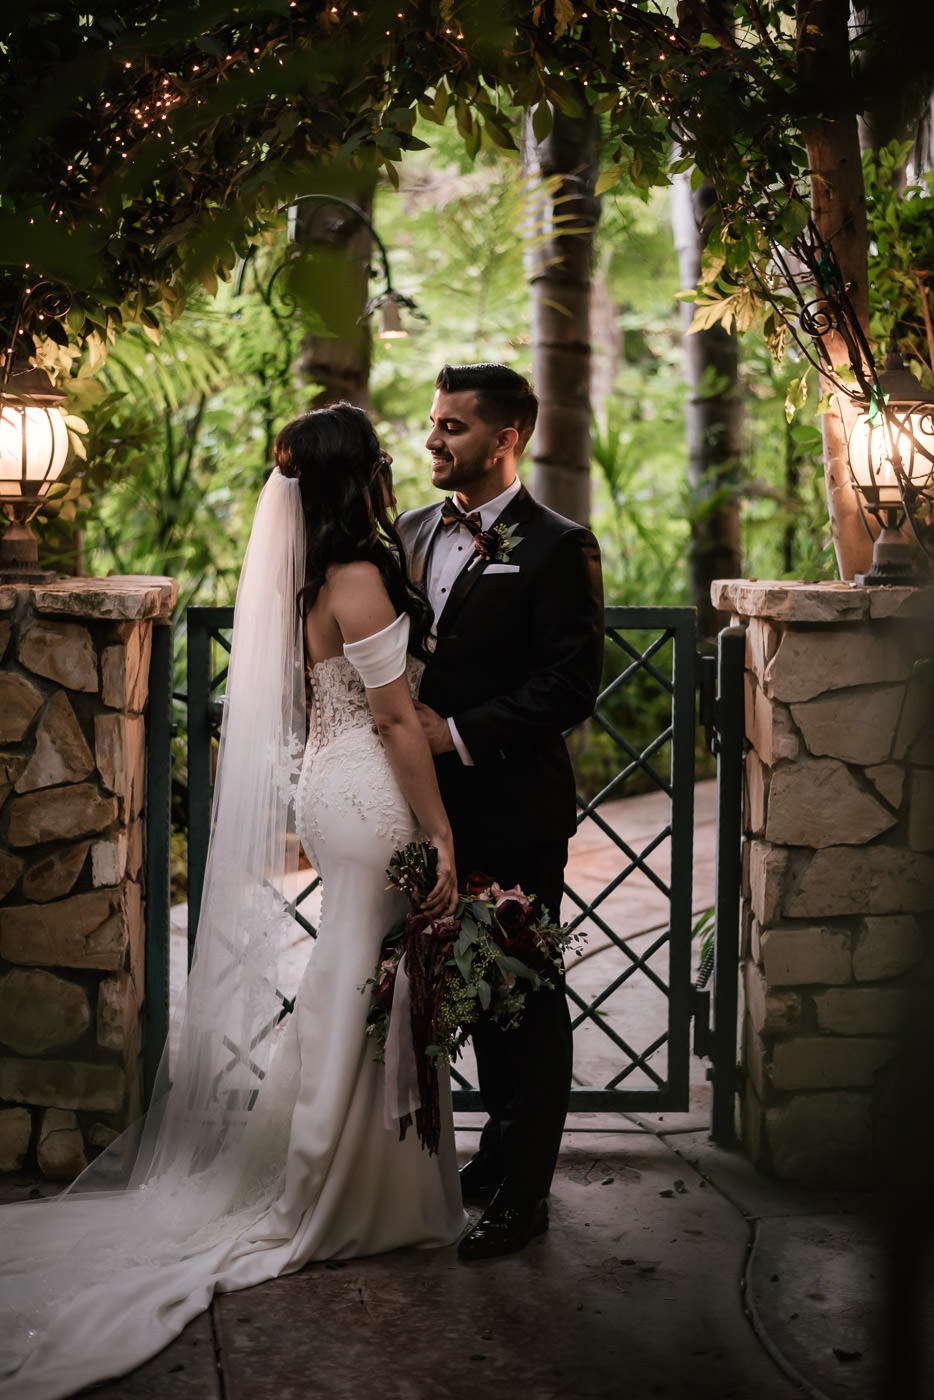 eden-gardens-wedding-photographer-romantic-81.jpg